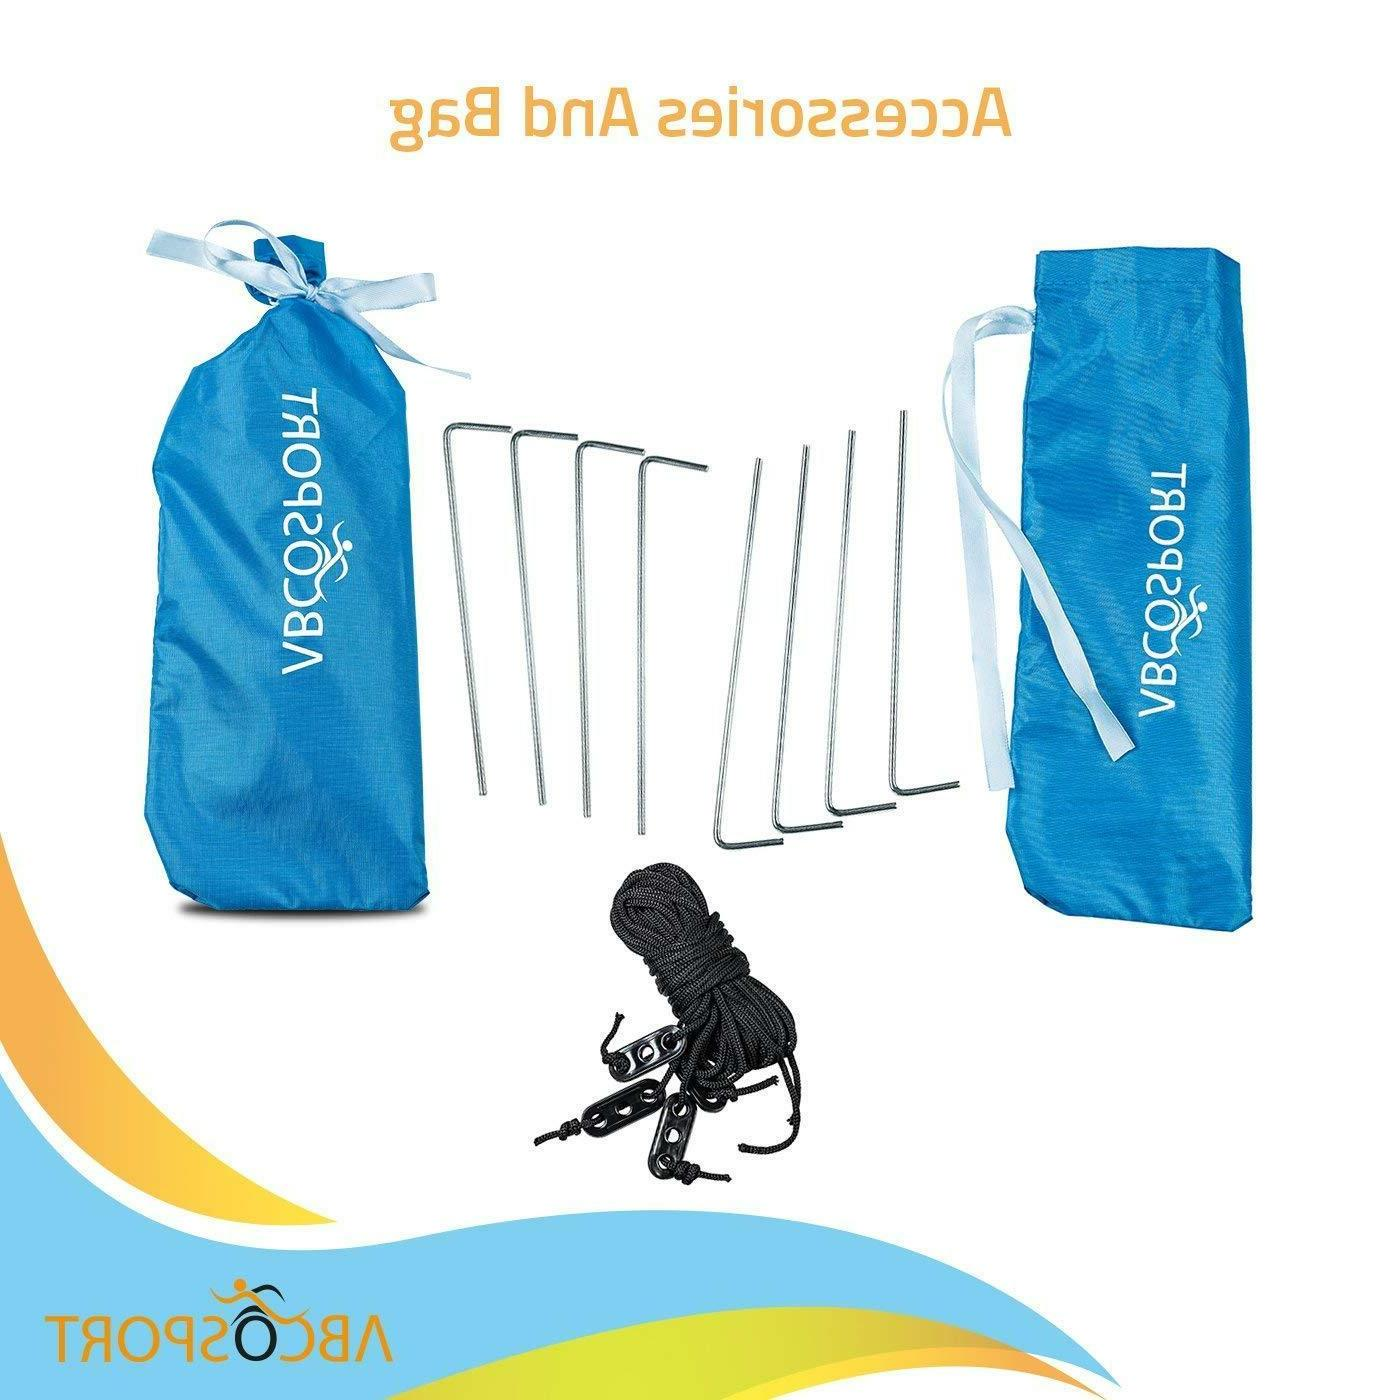 Instant Portable Beach Tent - 2